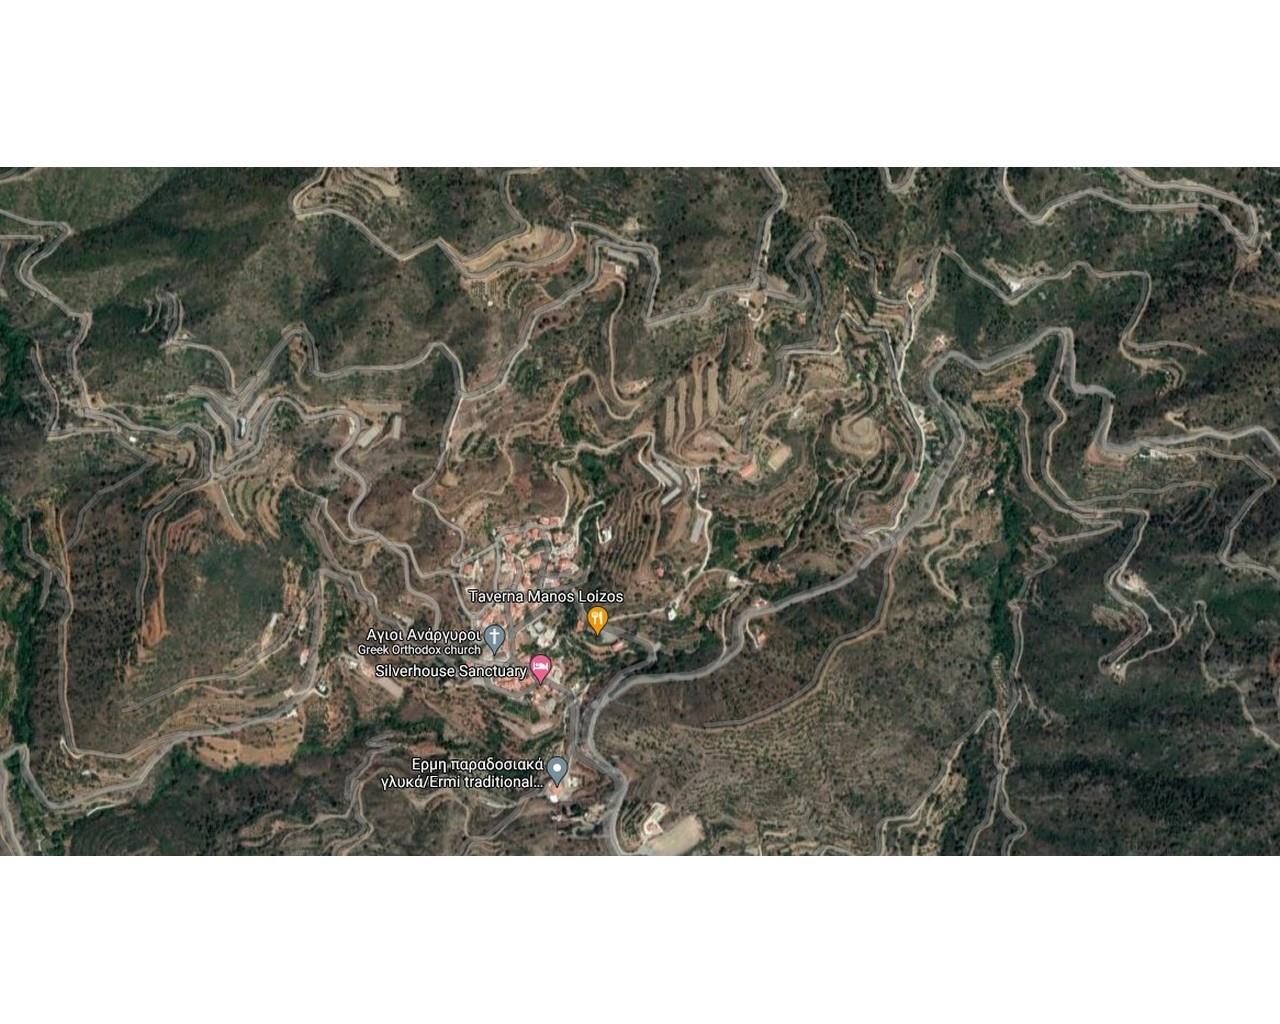 Land Larnaca(Agioi Vavatsinias)  335 SqMt for sale